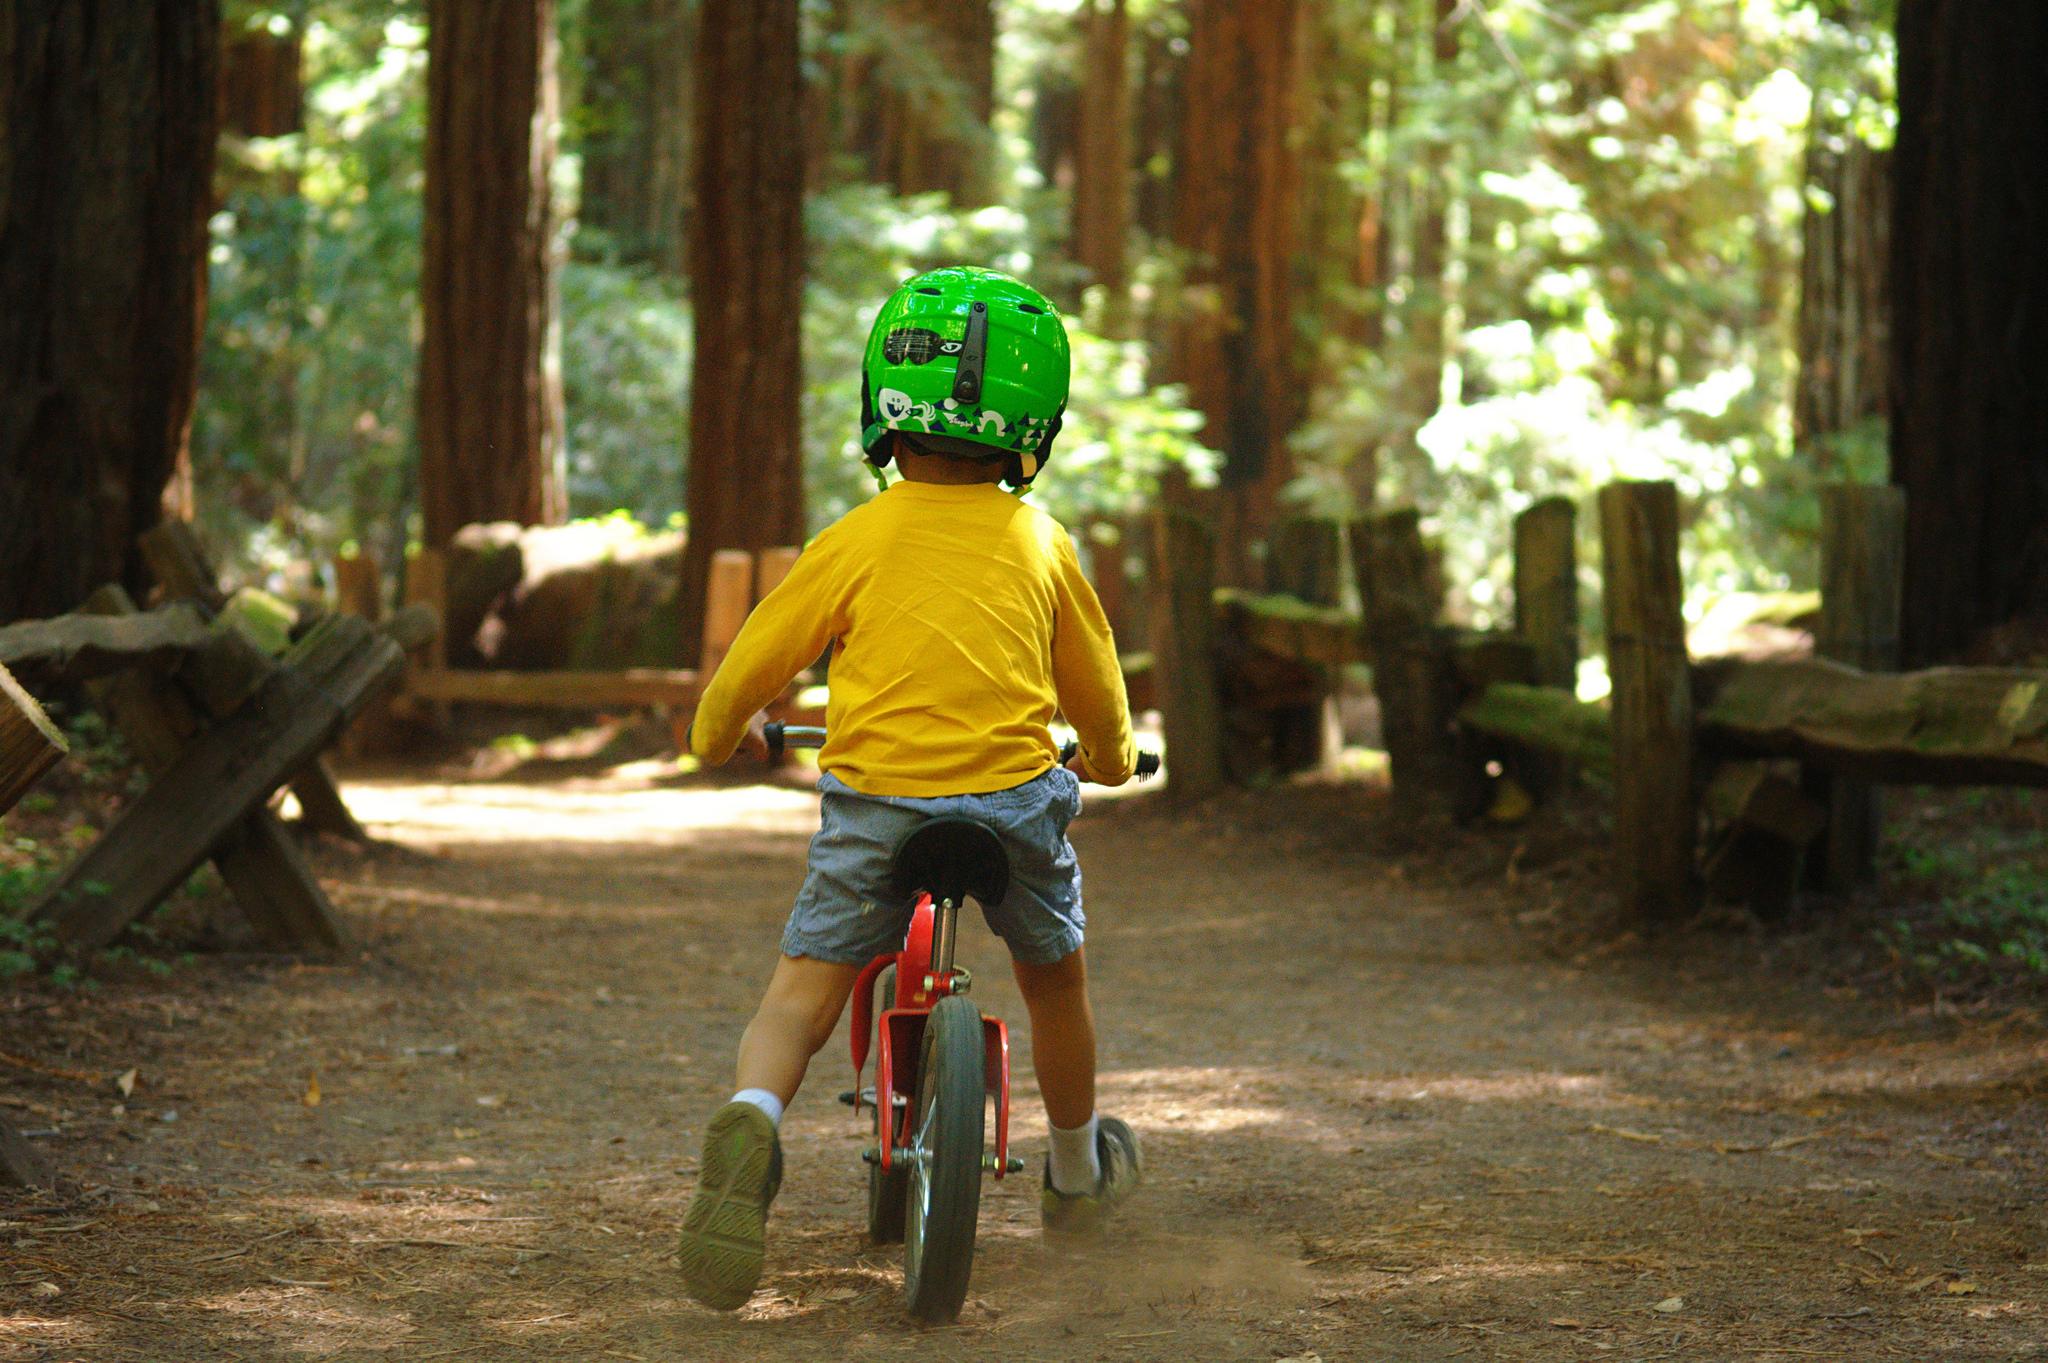 Biking through the woods © george ruiz/Flickr